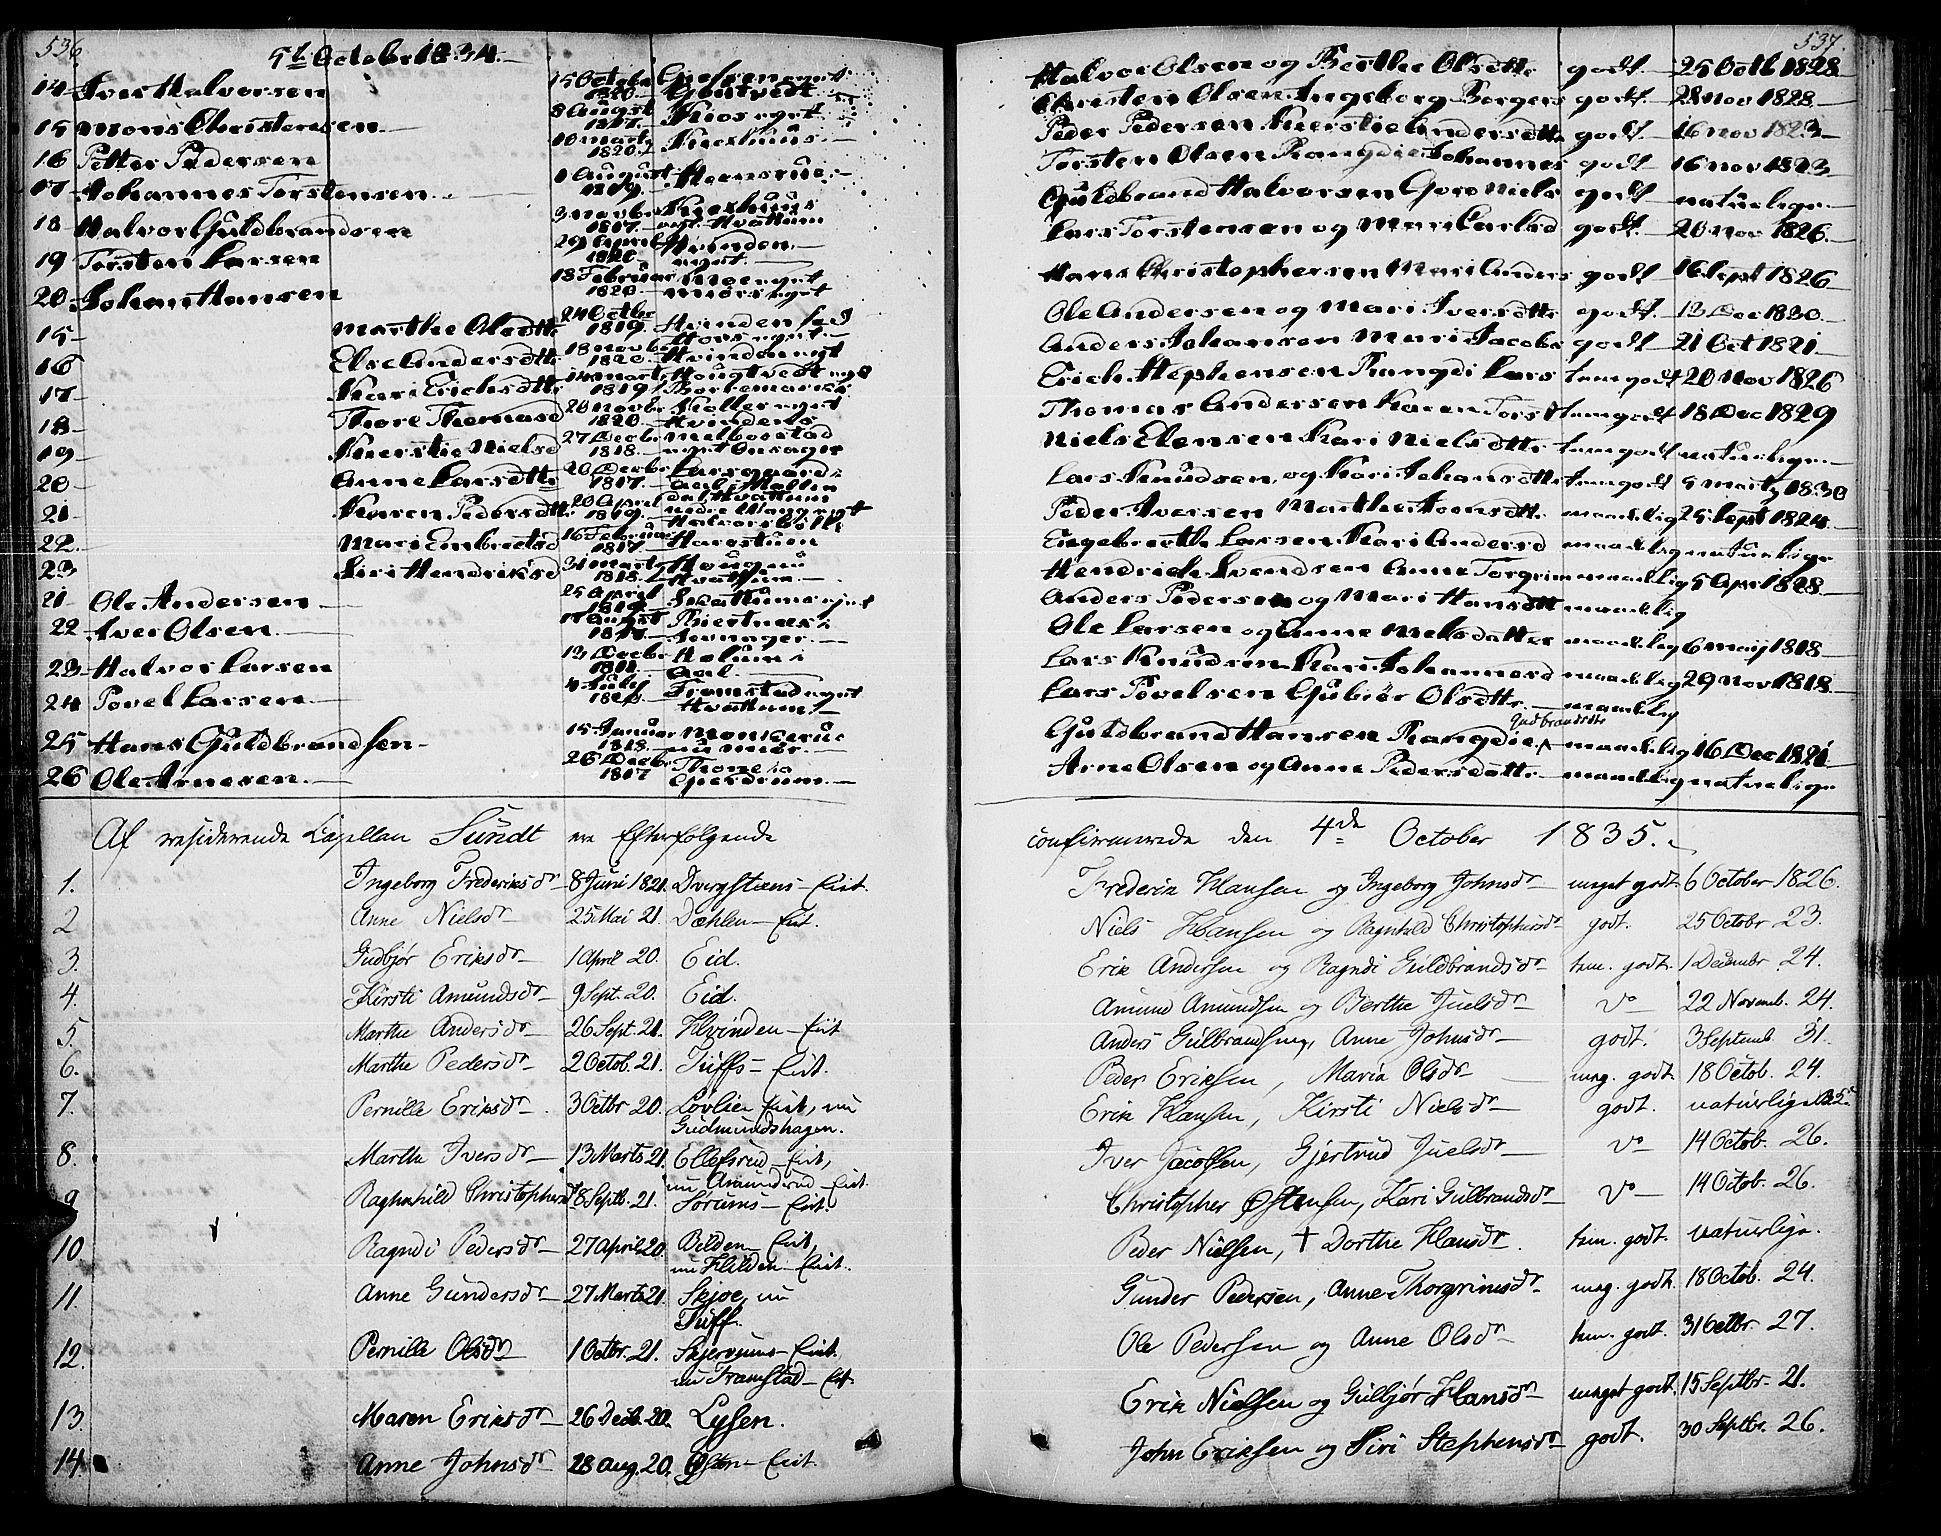 SAH, Gran prestekontor, Ministerialbok nr. 10, 1824-1842, s. 536-537